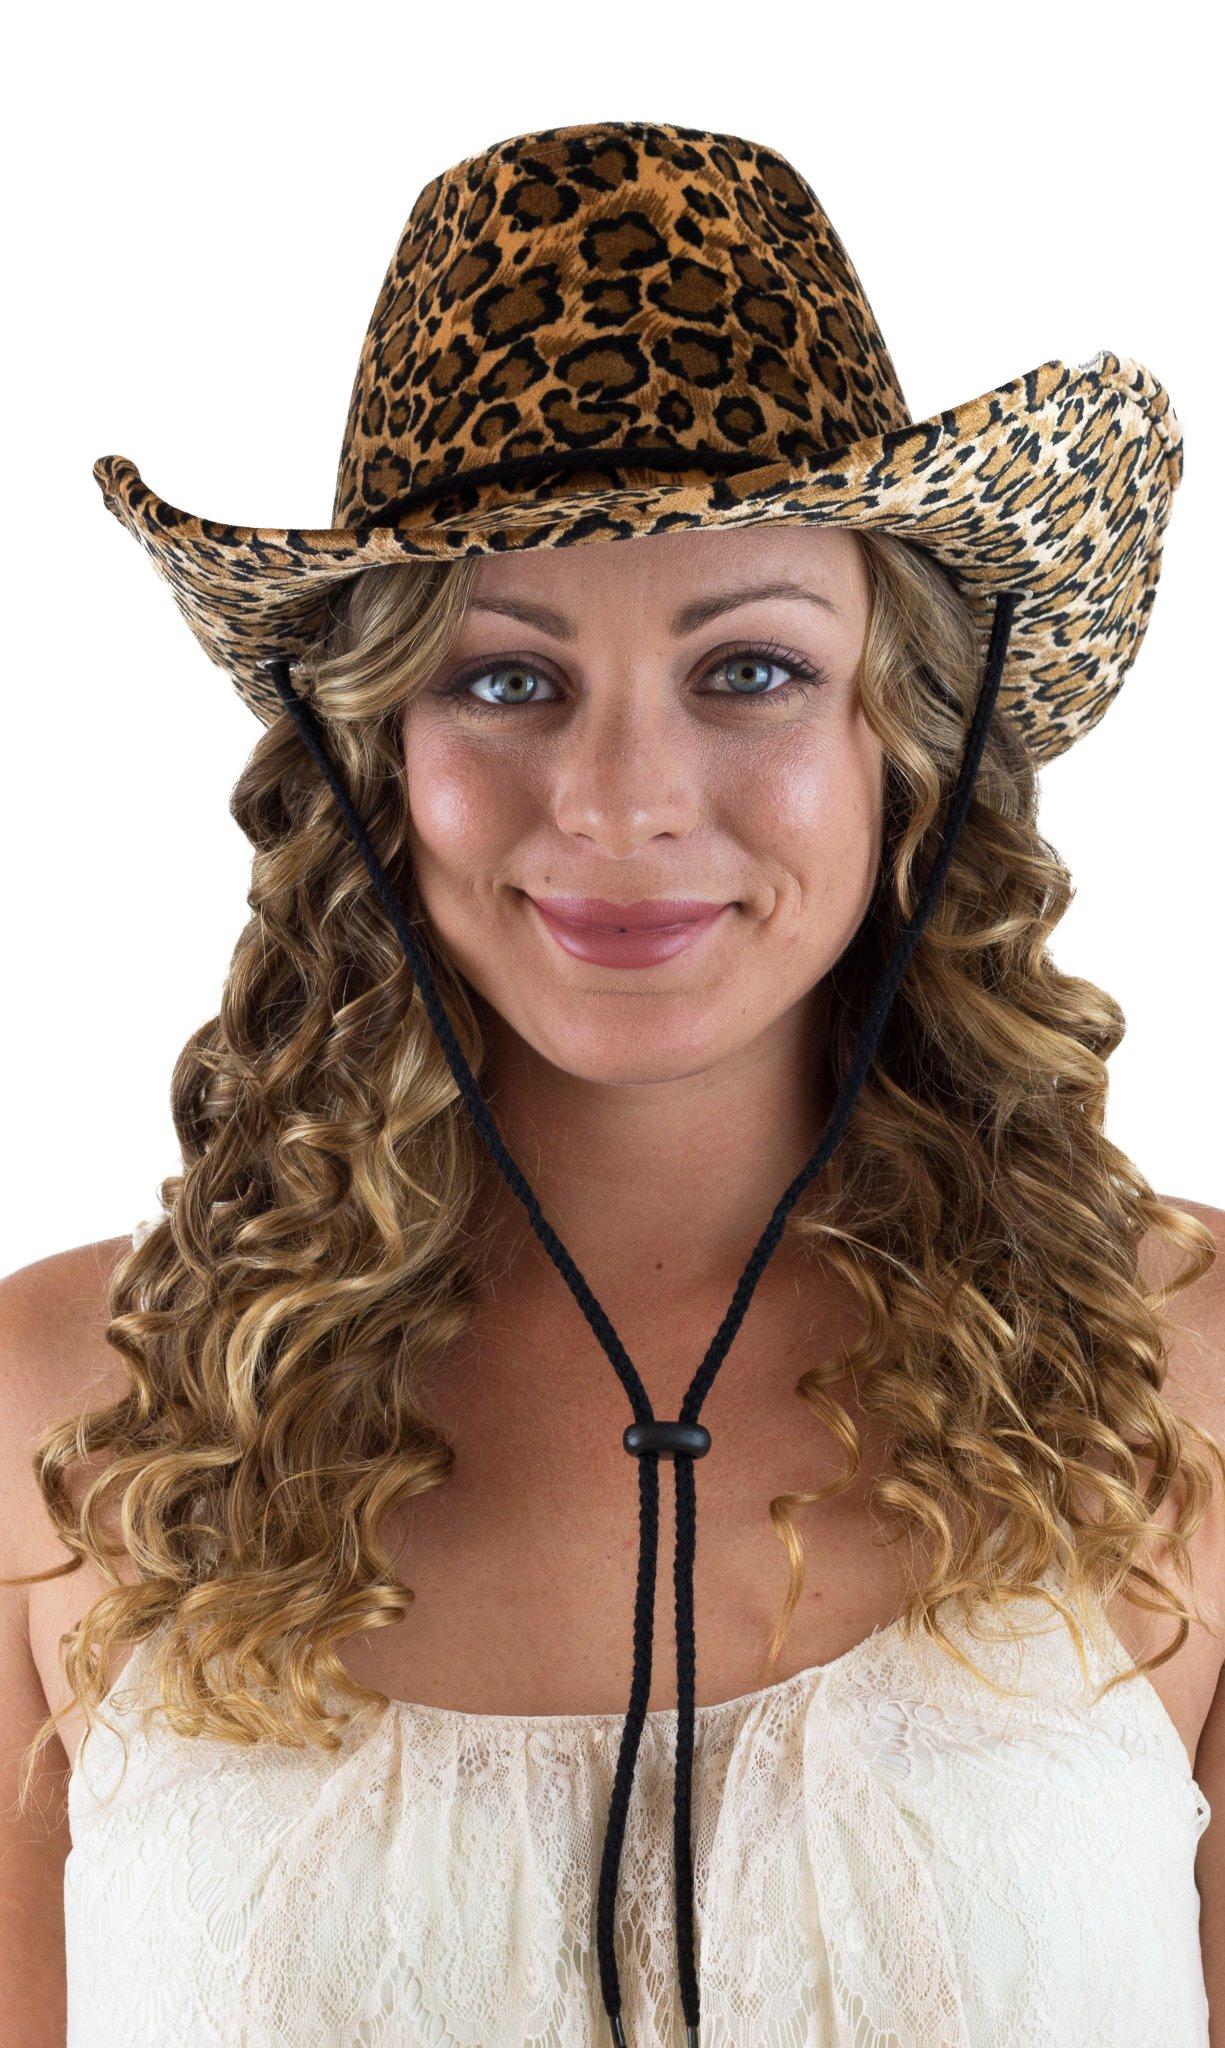 CAPTAIN FLOATY Captain Women Cowboy Hat Cowgirl & Horse Riding Hats Felt Summer Drifter Leopard Print One Size